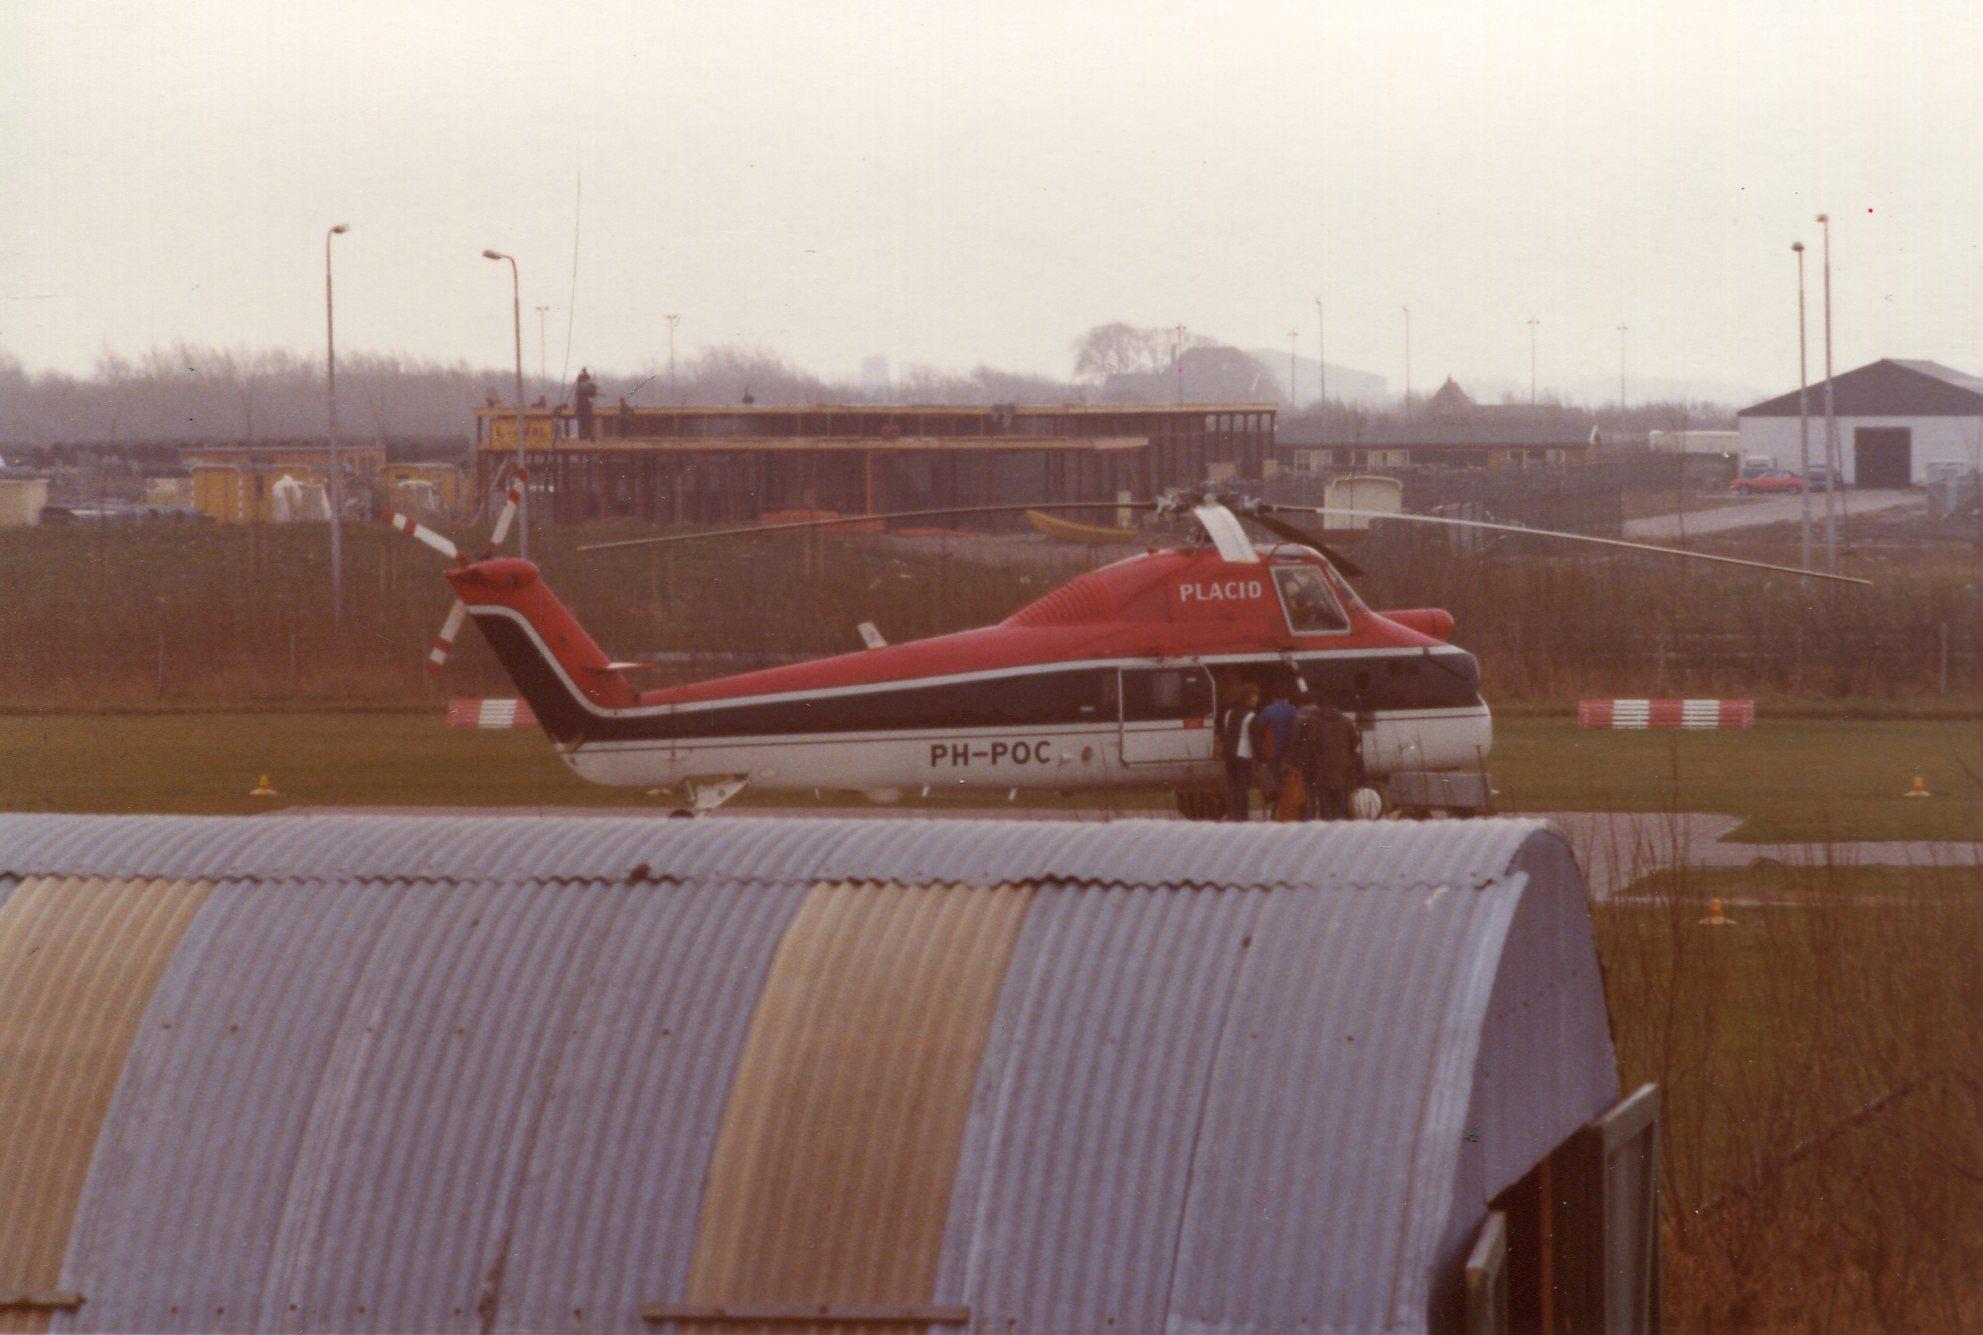 Naam: Den Helder , april 1977 (2).jpg Bekeken: 402 Grootte: 271,9 KB